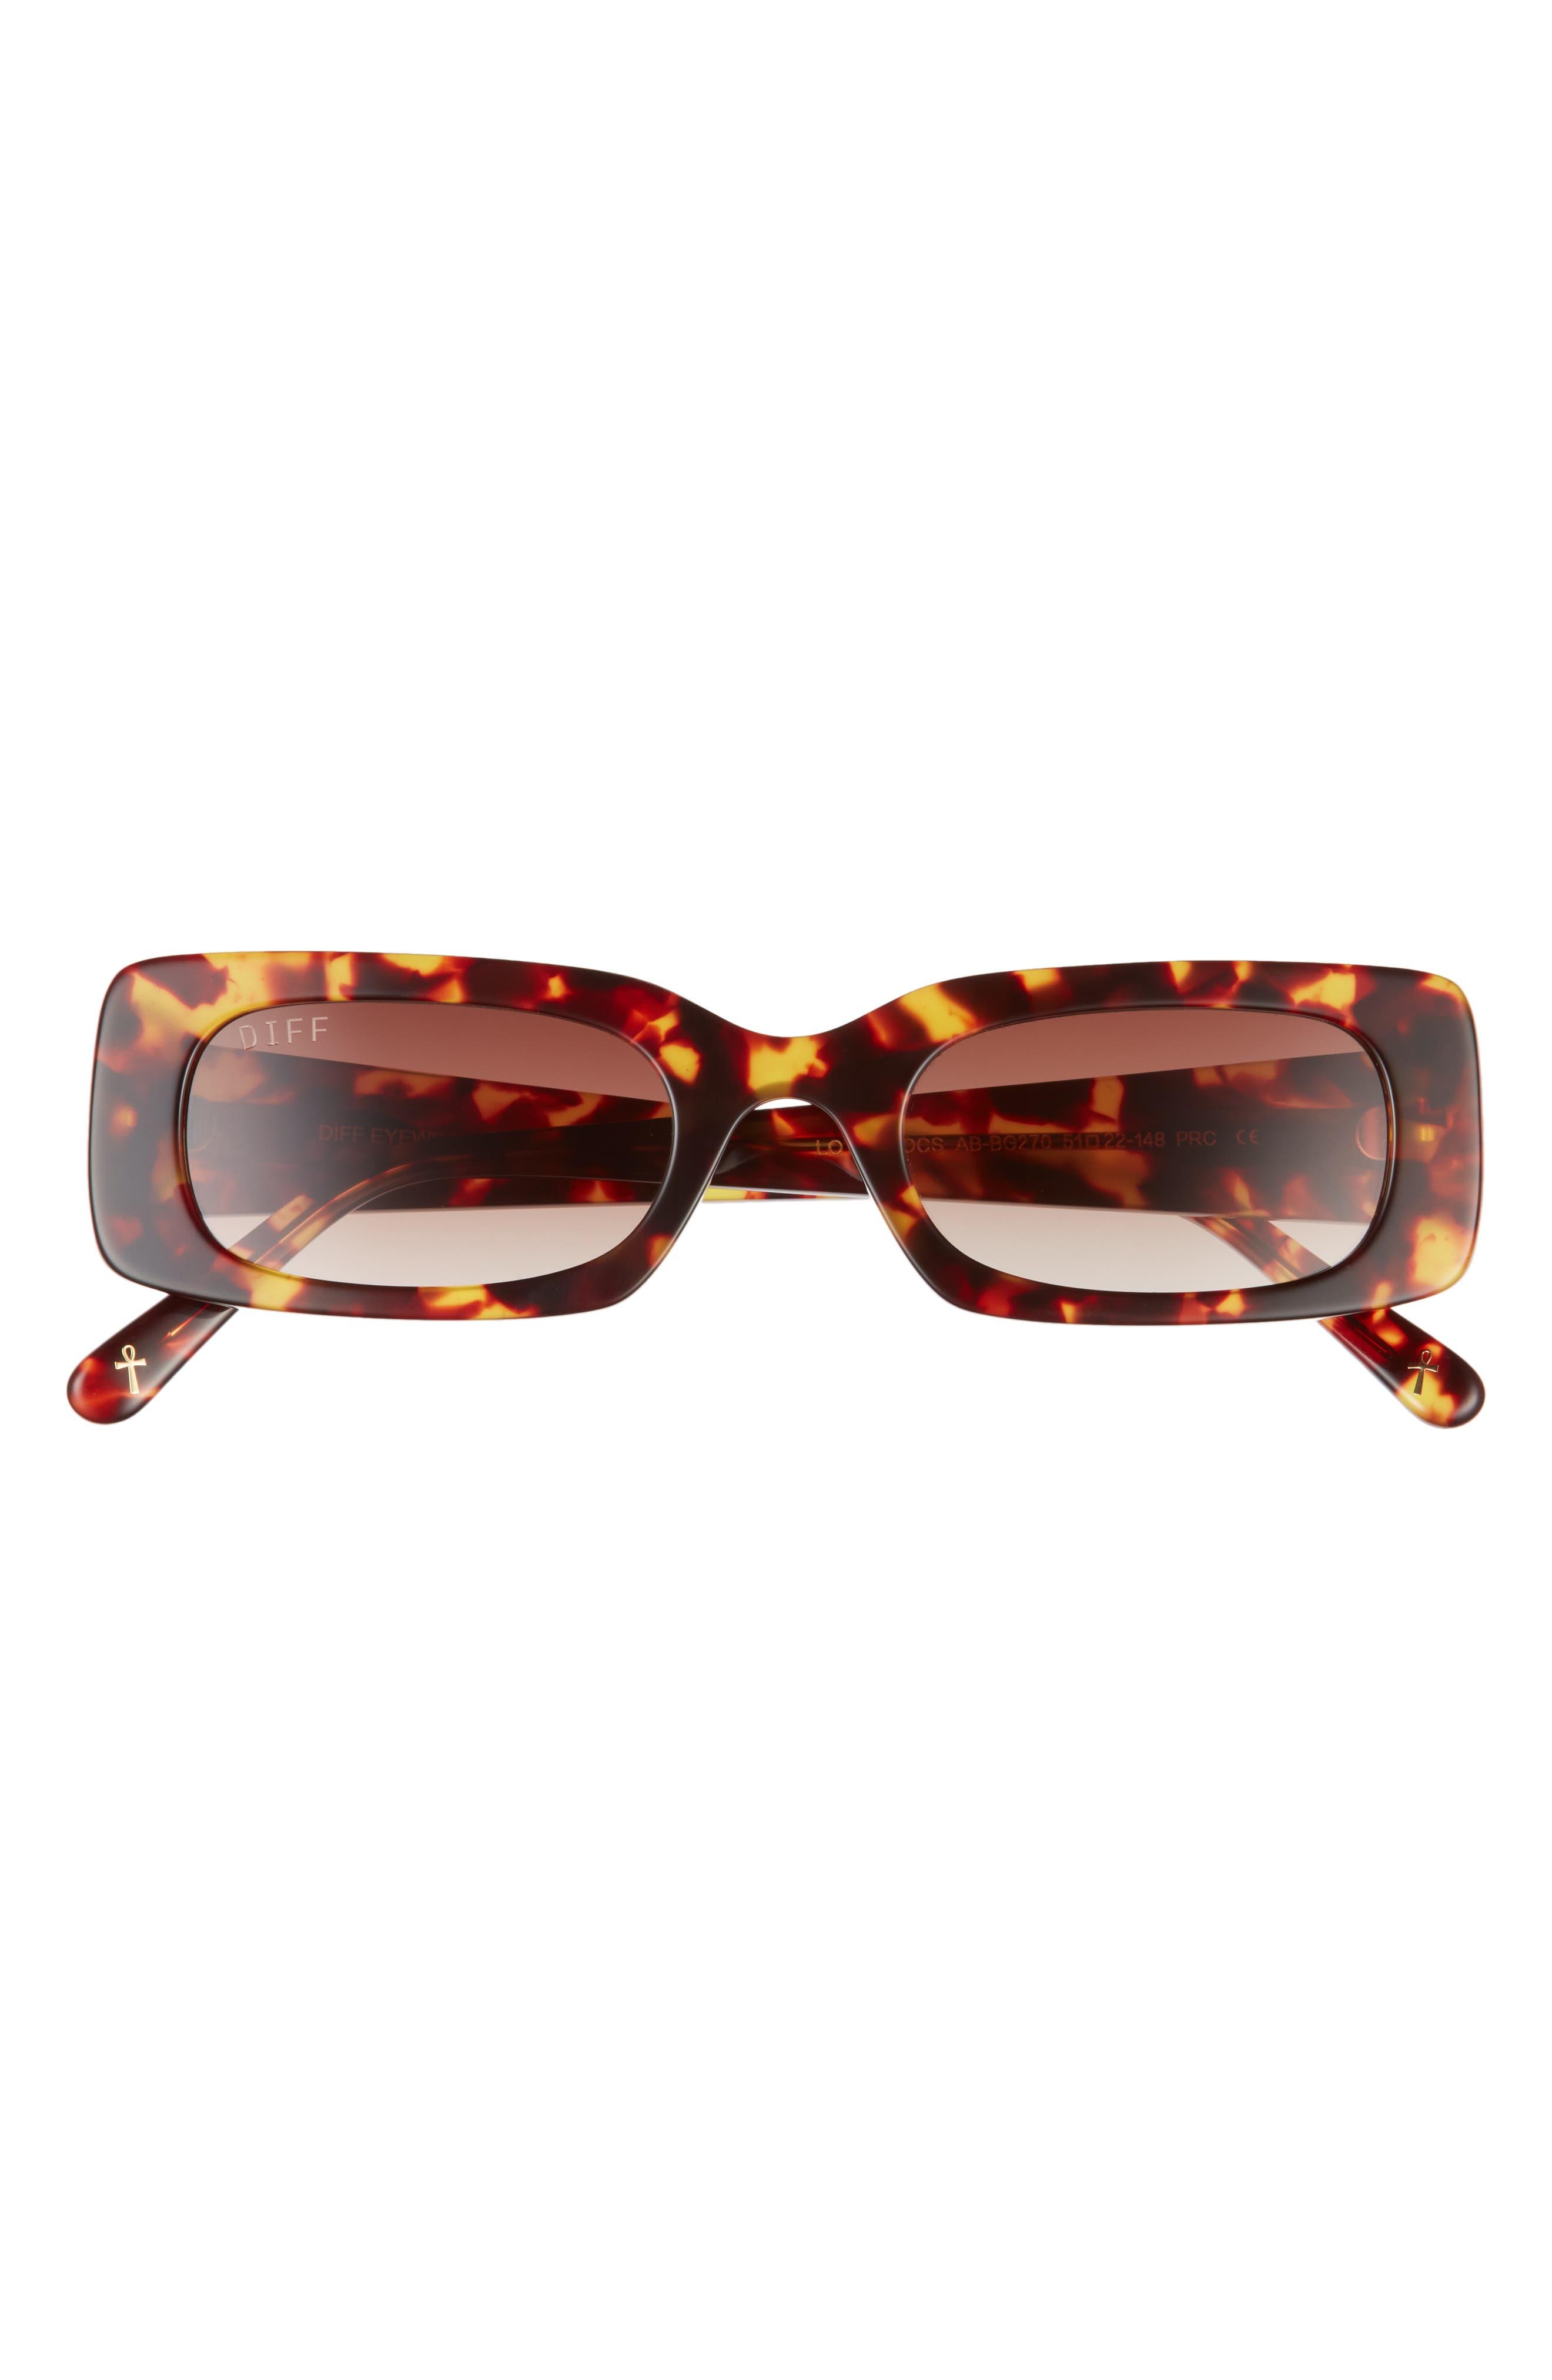 X Lauren London Lotus Locs 54mm Rectangular Sunglasses